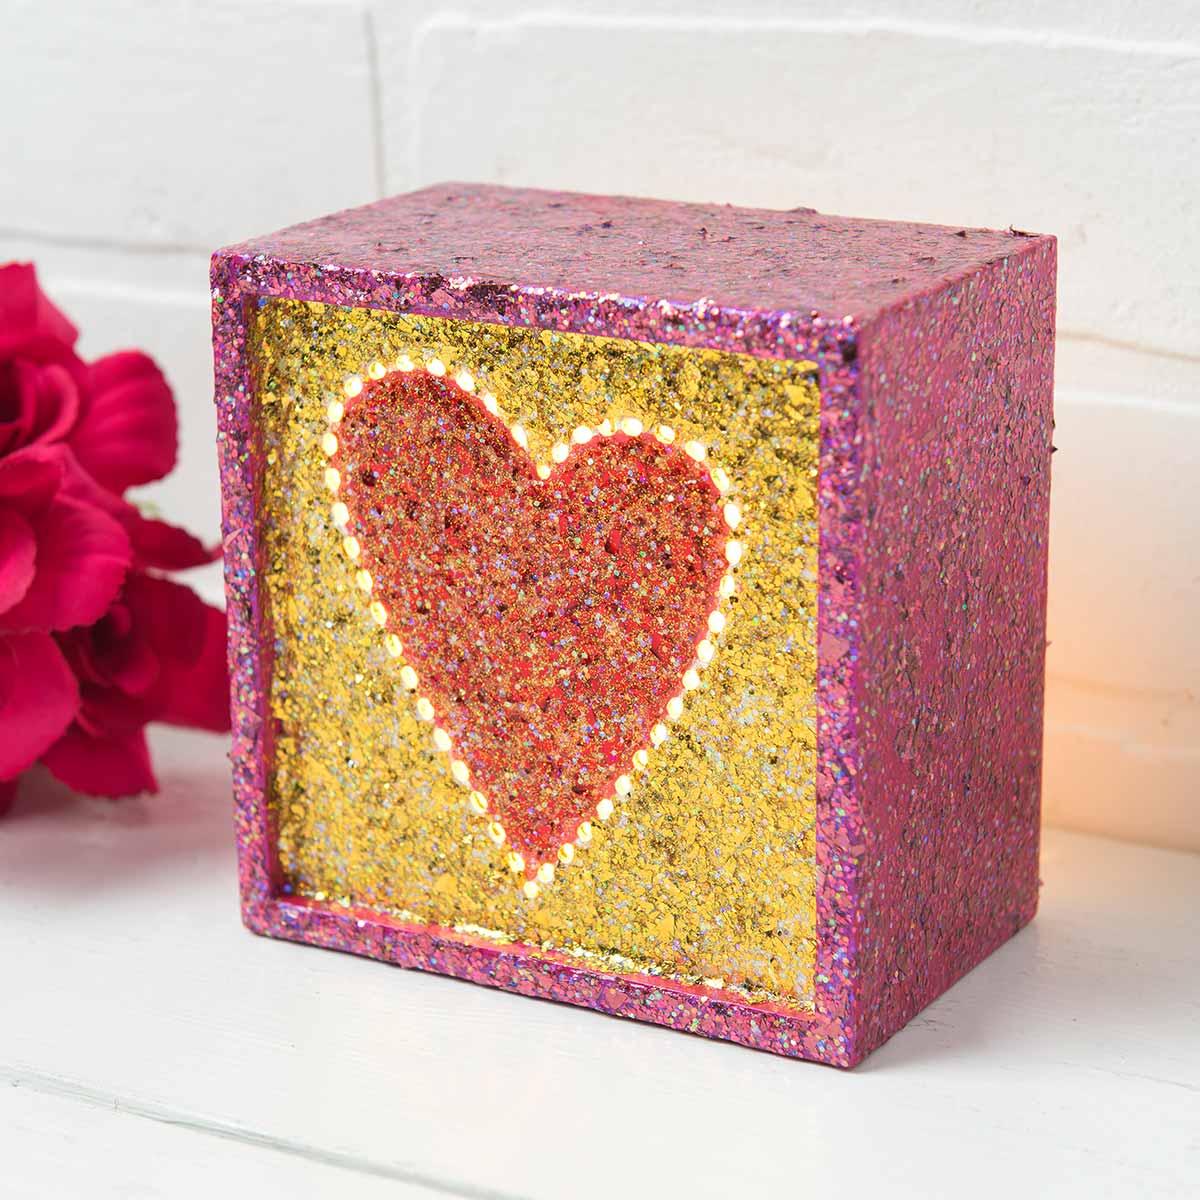 Glittery Heart Box for Valentine's Day